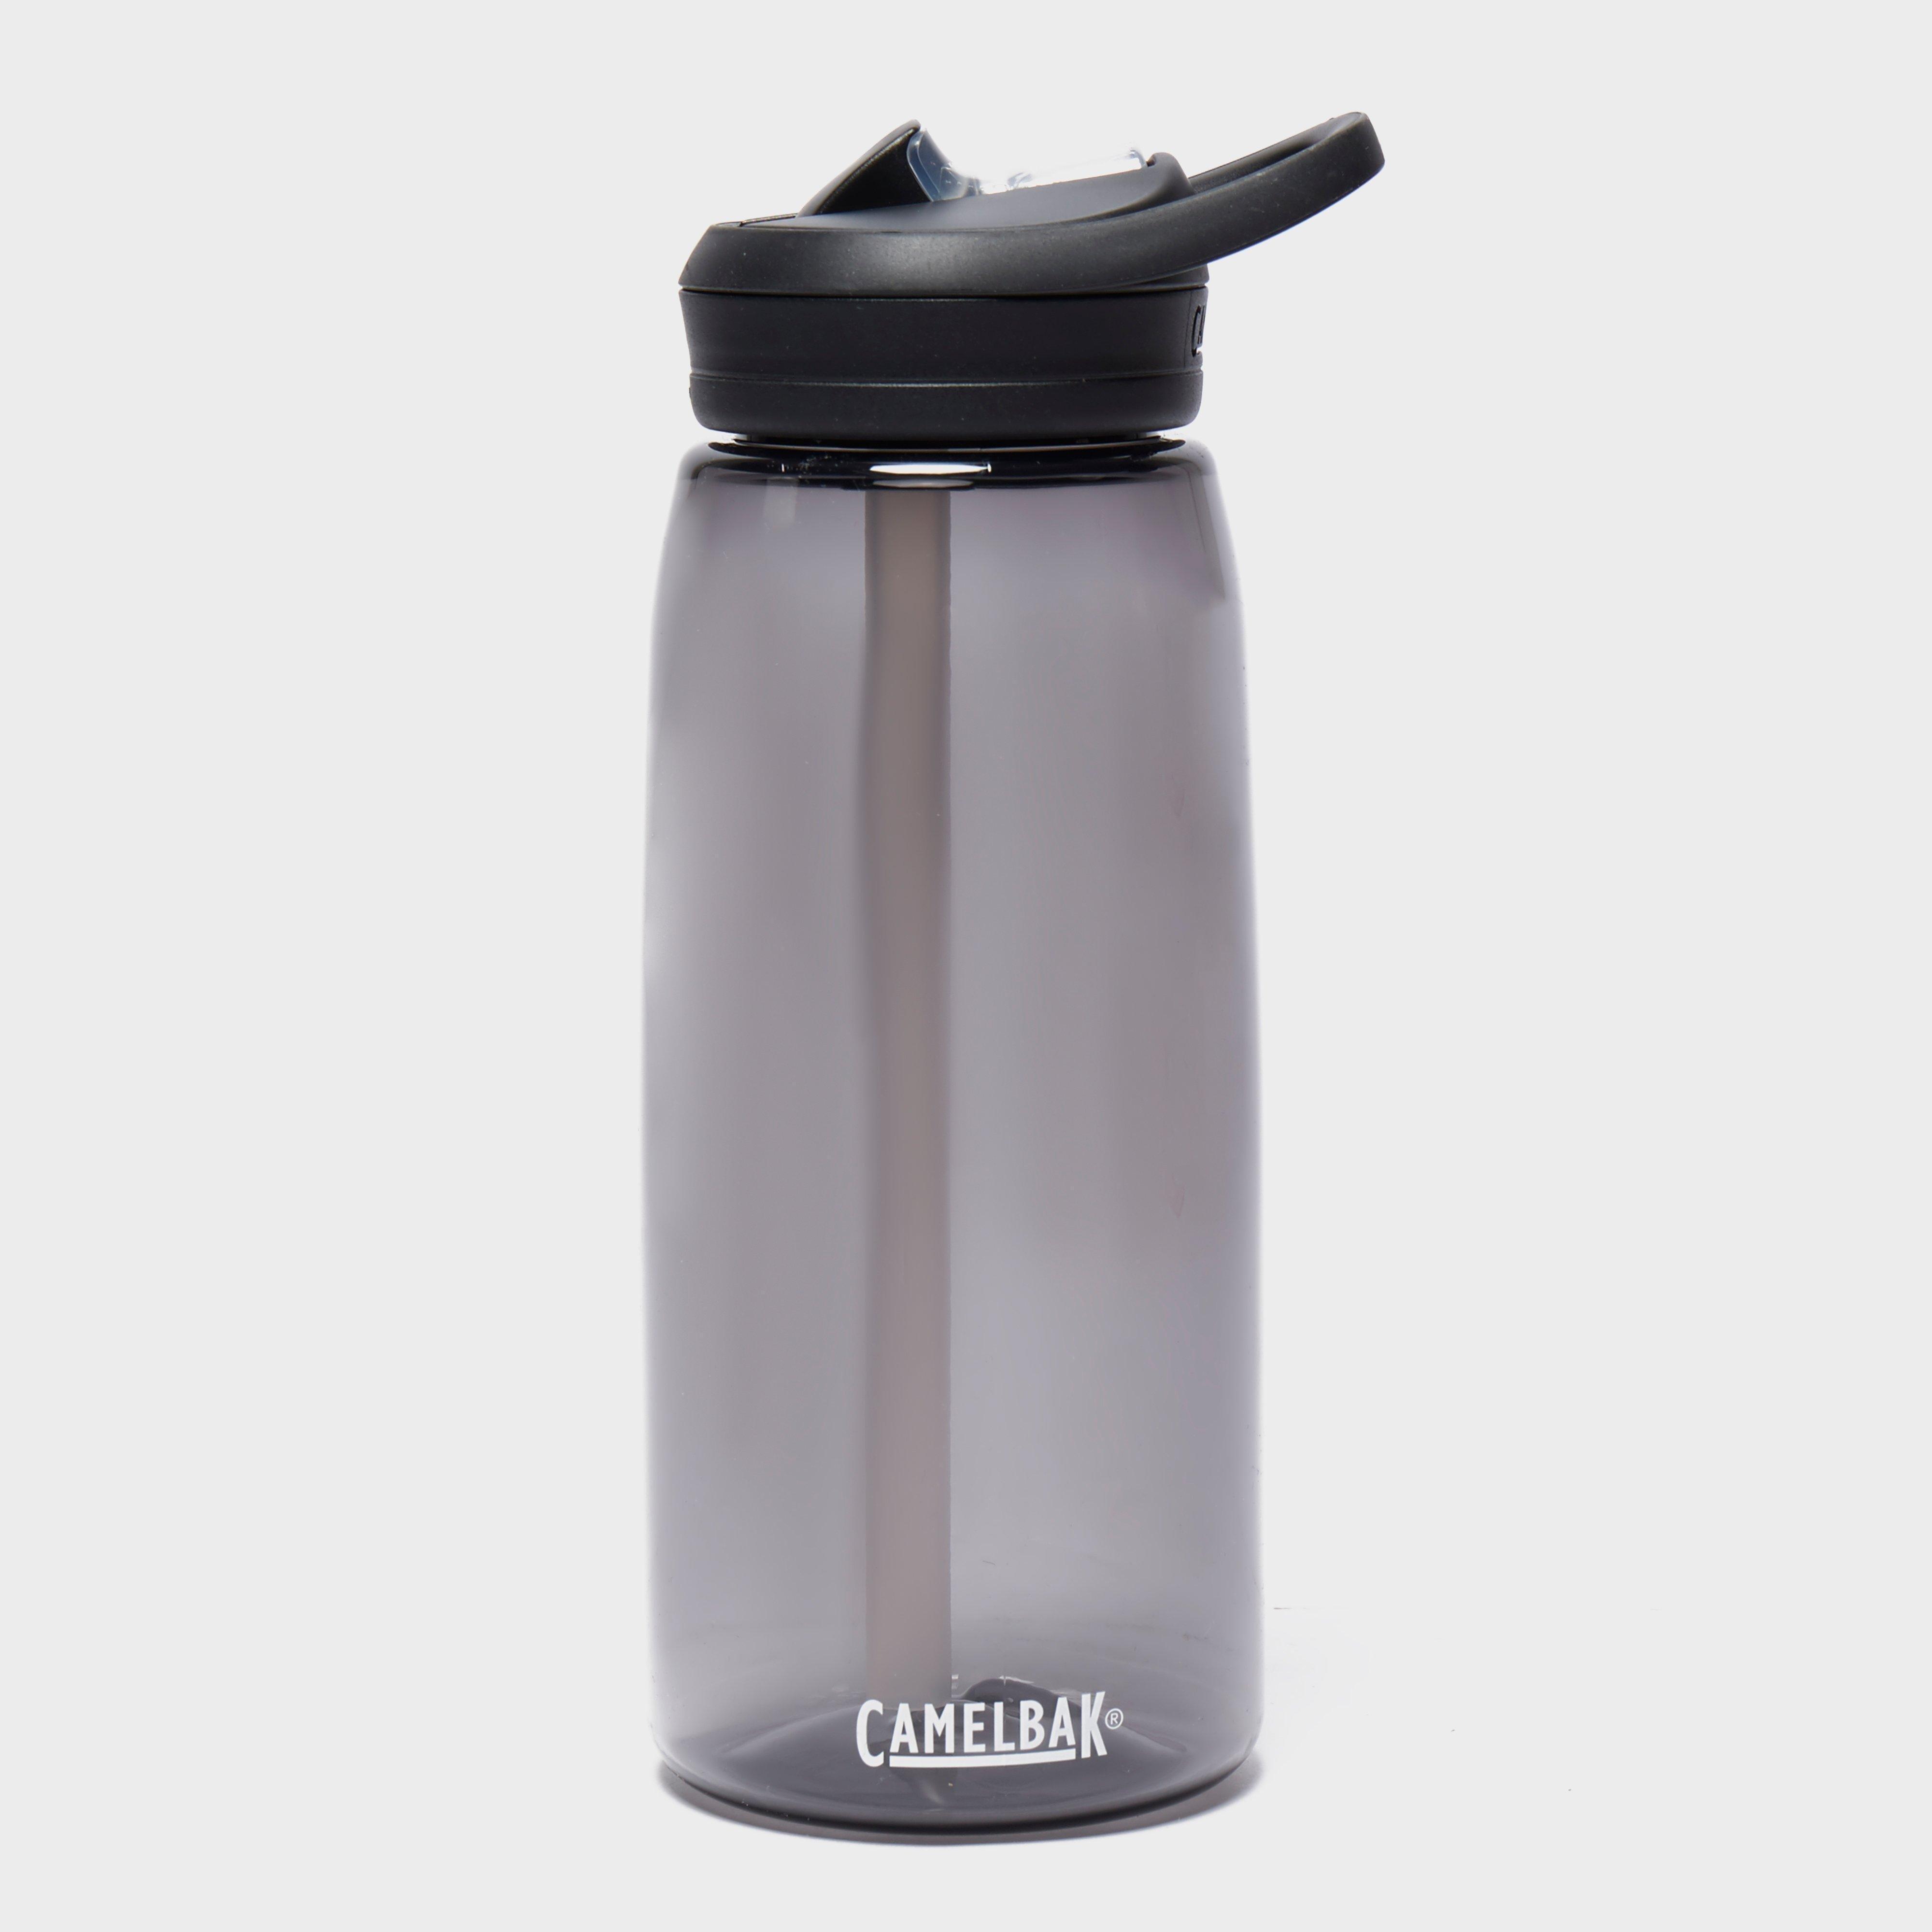 Camelbak Camelbak Eddy+ 1L Bottle - Grey, Grey